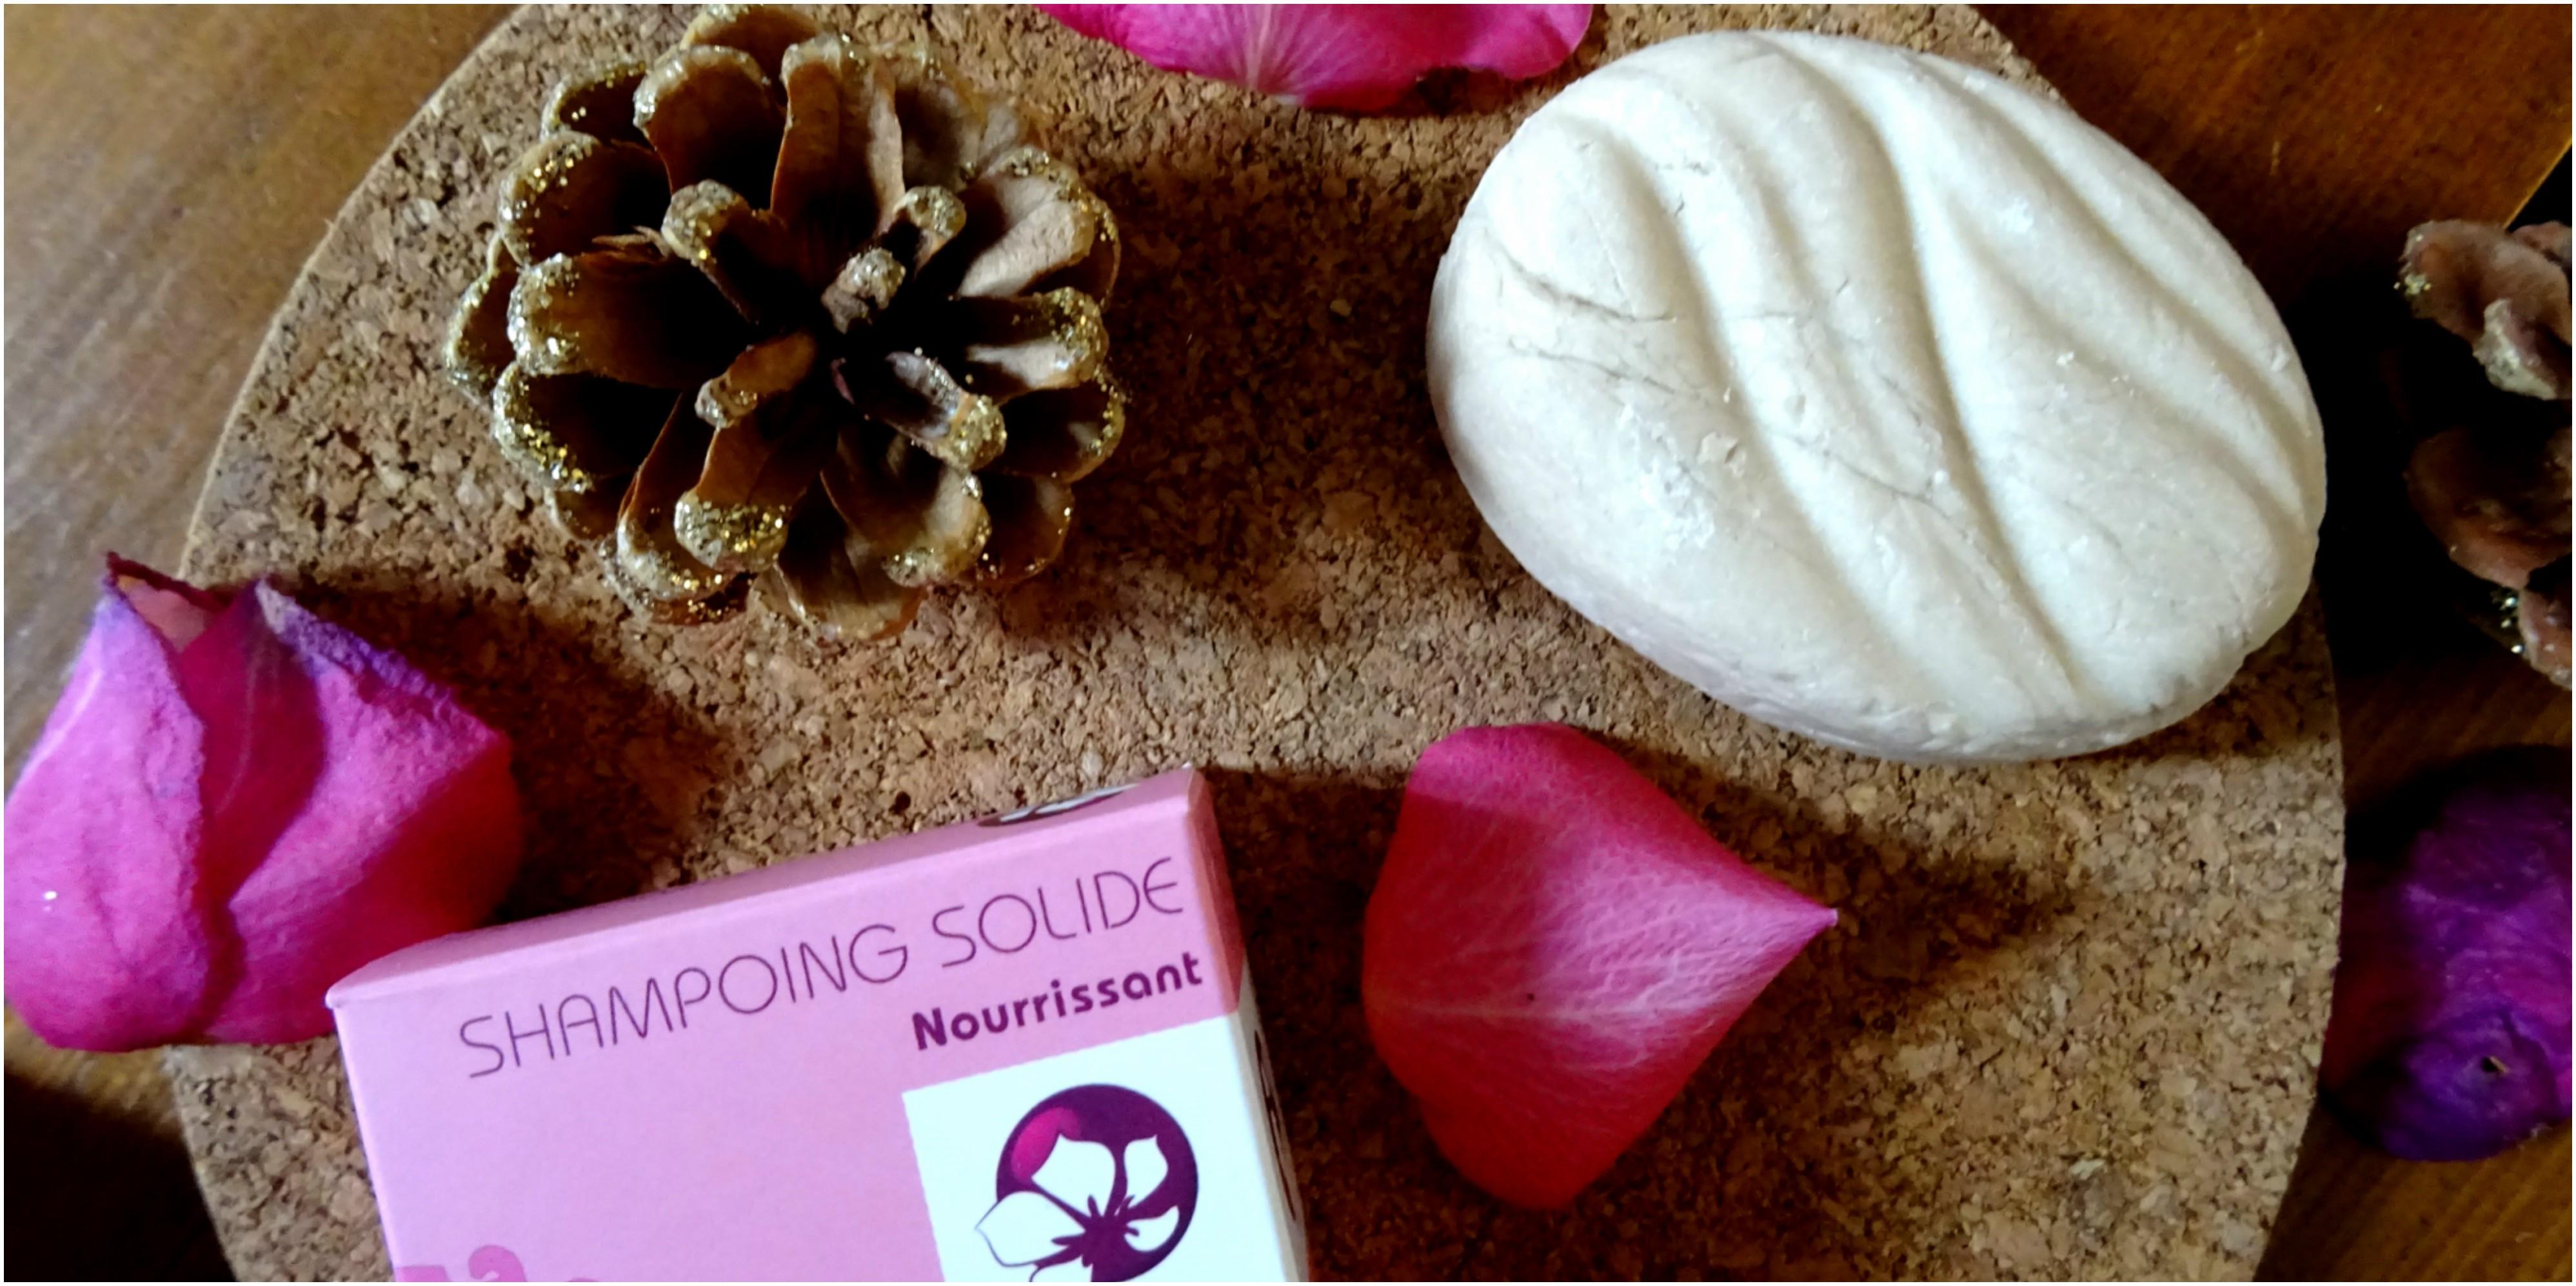 shampoing-solide-pachamamai-nourrissant-avis-blog